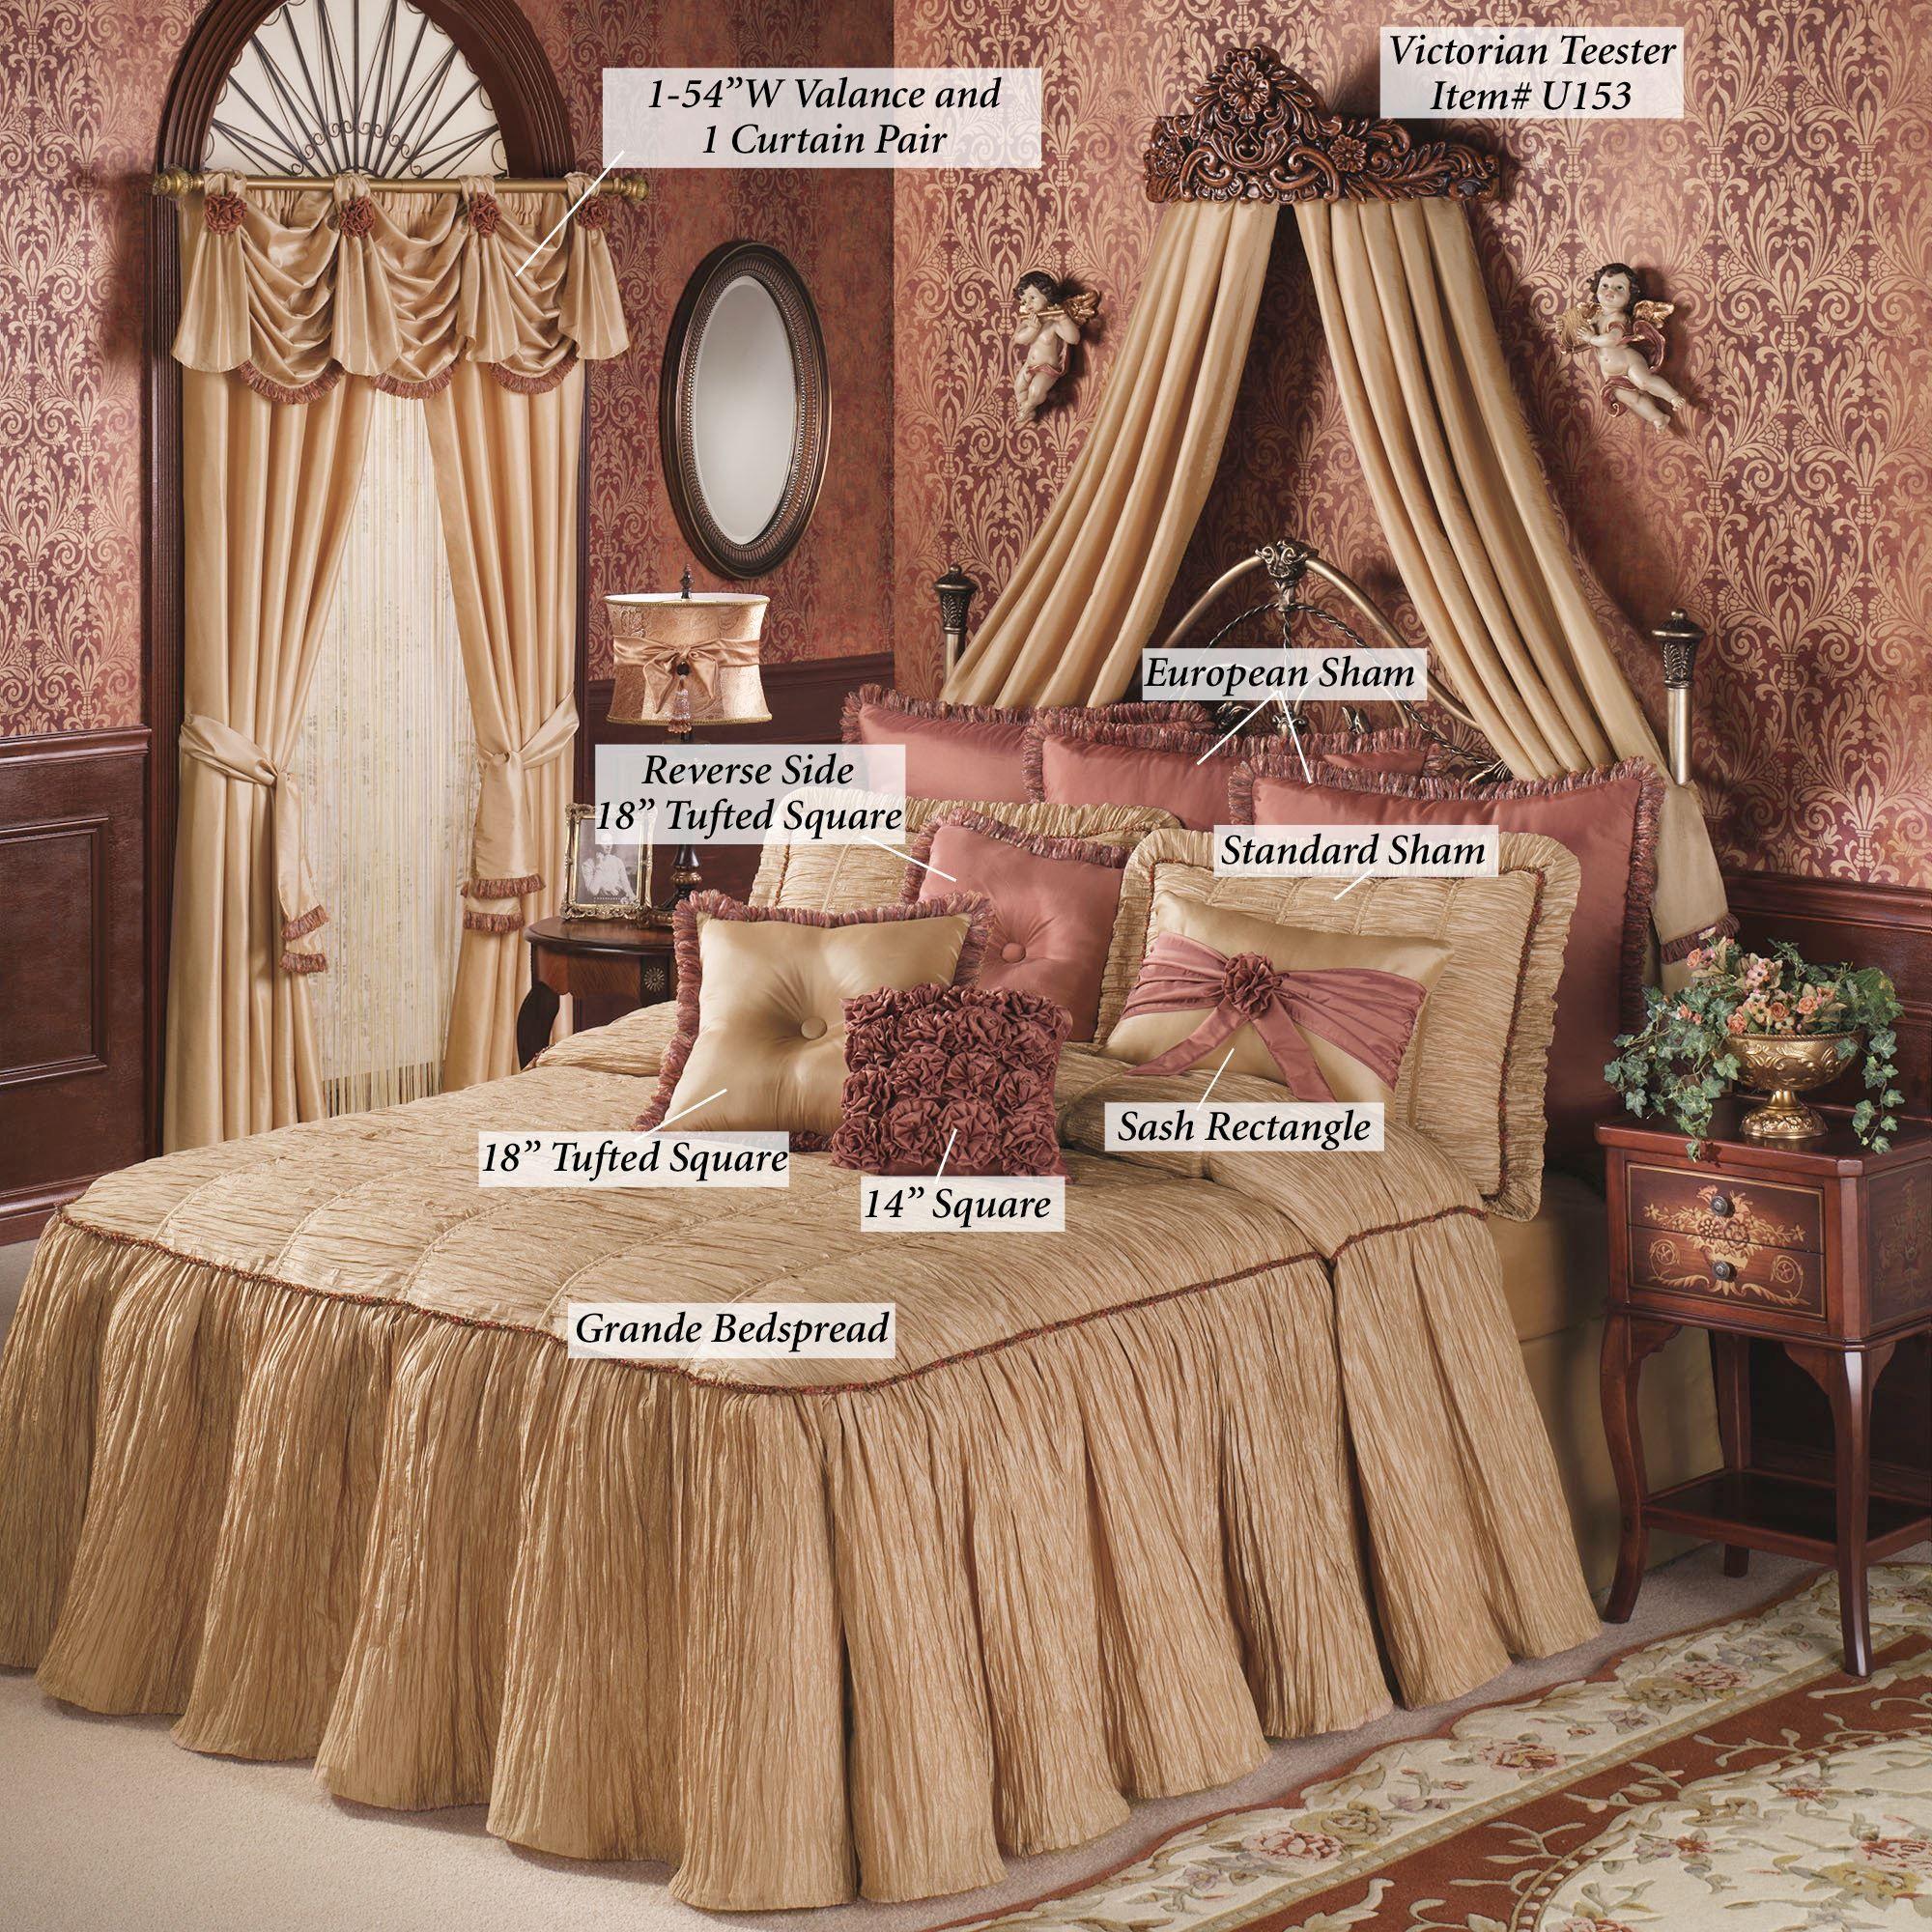 Victorian Bedspreads And Curtains Revolutionhr